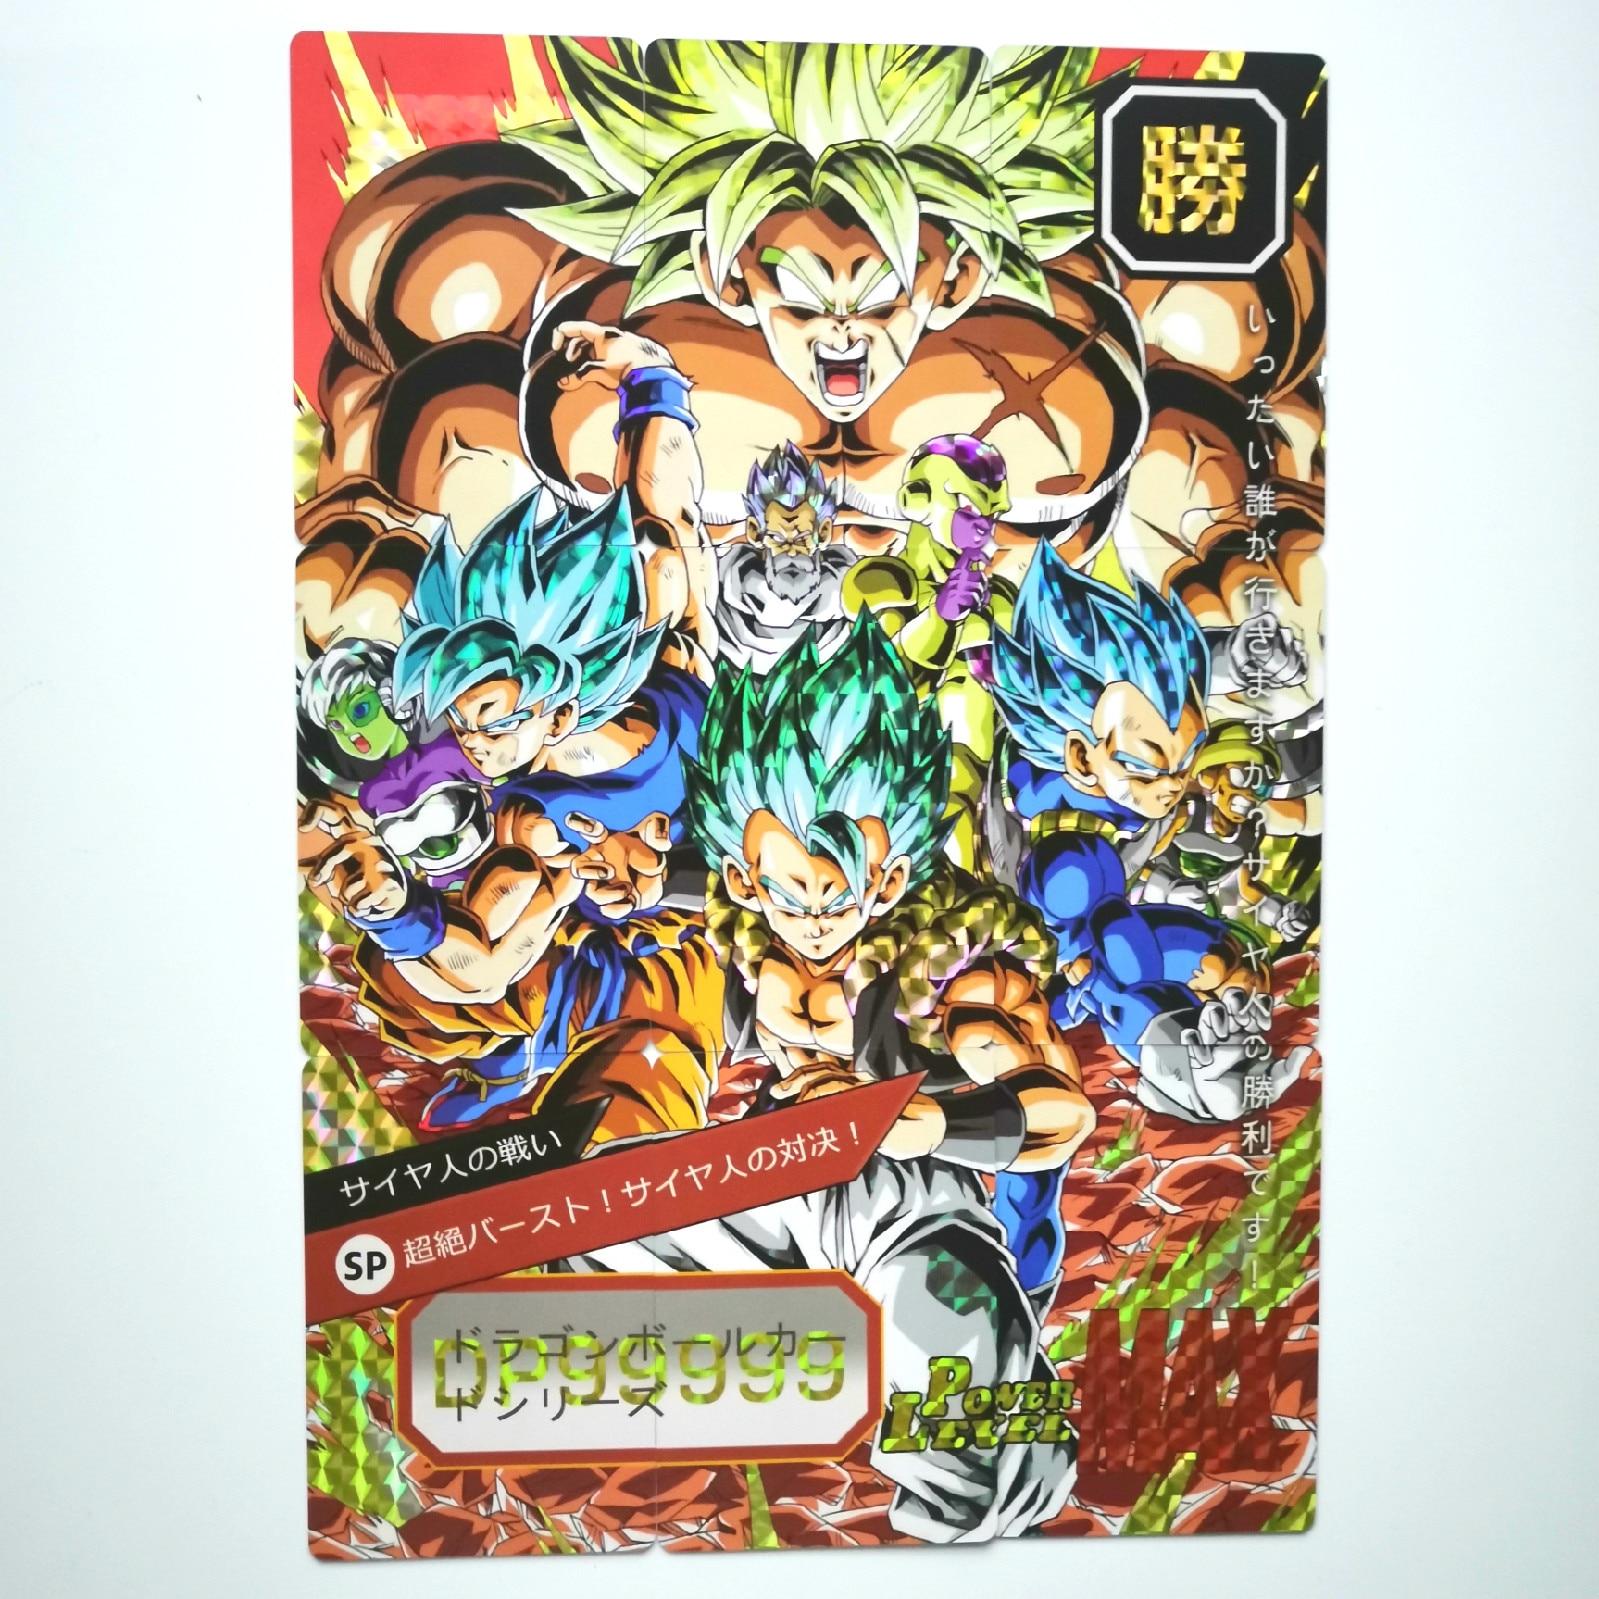 54pcs/set Super Dragon Ball Z Limited To 50 Sets Heroes Battle Card Ultra Instinct Goku Vegeta Super Game Collection Cards